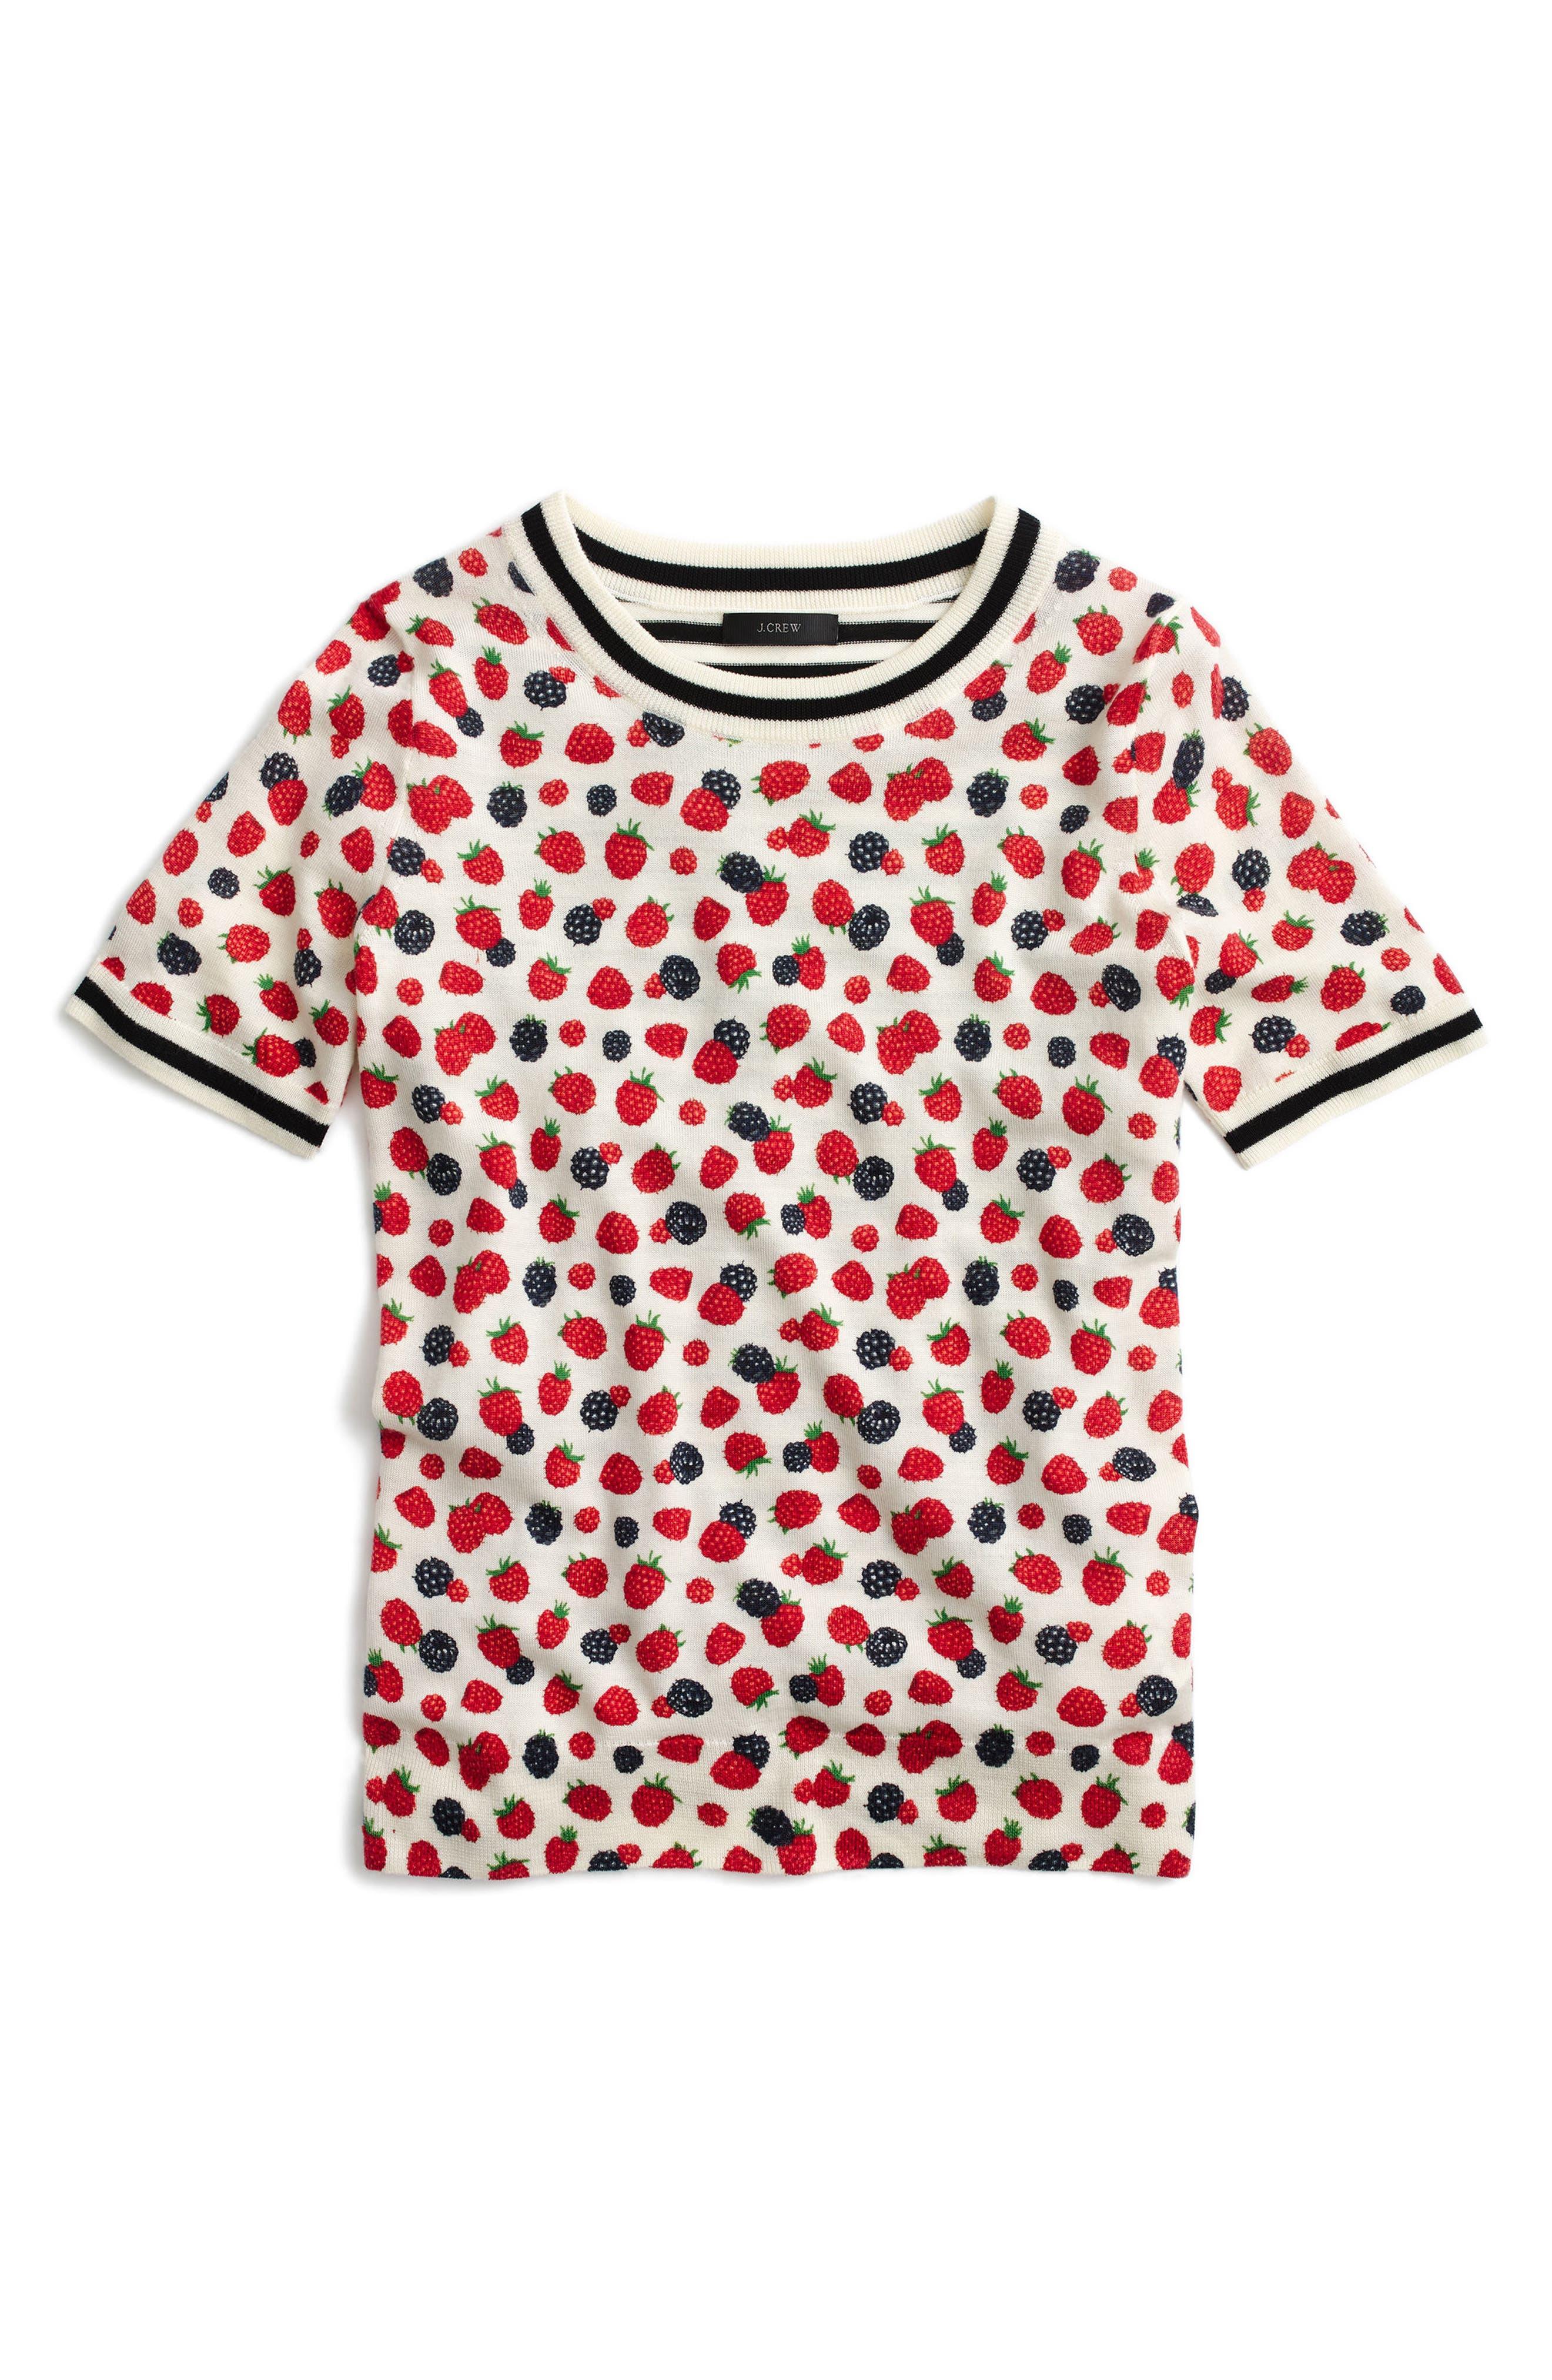 Alternate Image 1 Selected - J.Crew Tippi Berry Print Short Sleeve Sweater